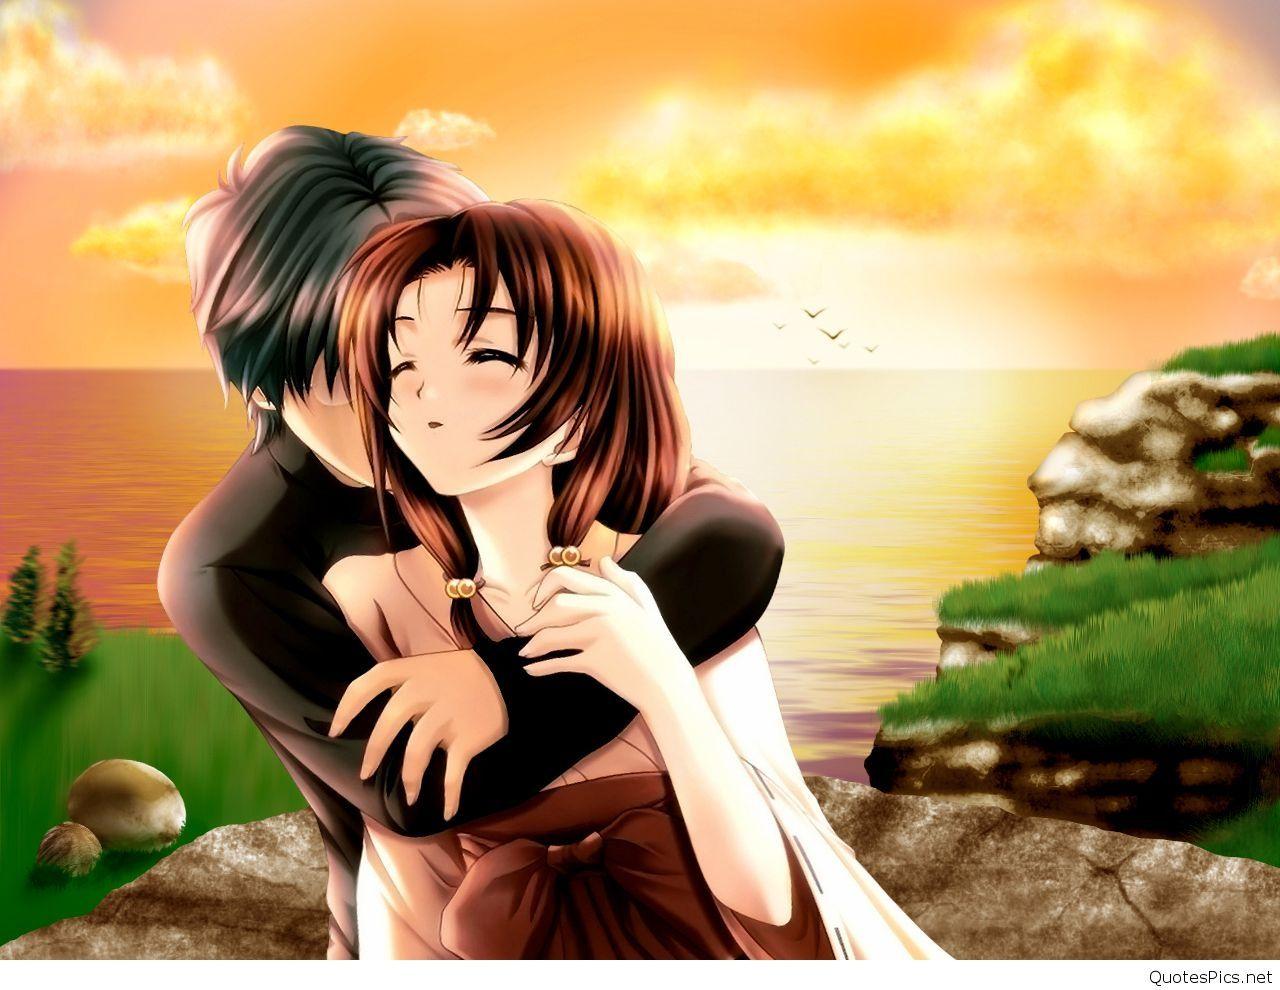 Romantic Love Cartoon Hd Images Shareimagesco Impressive Love Cartoon Picture Hd